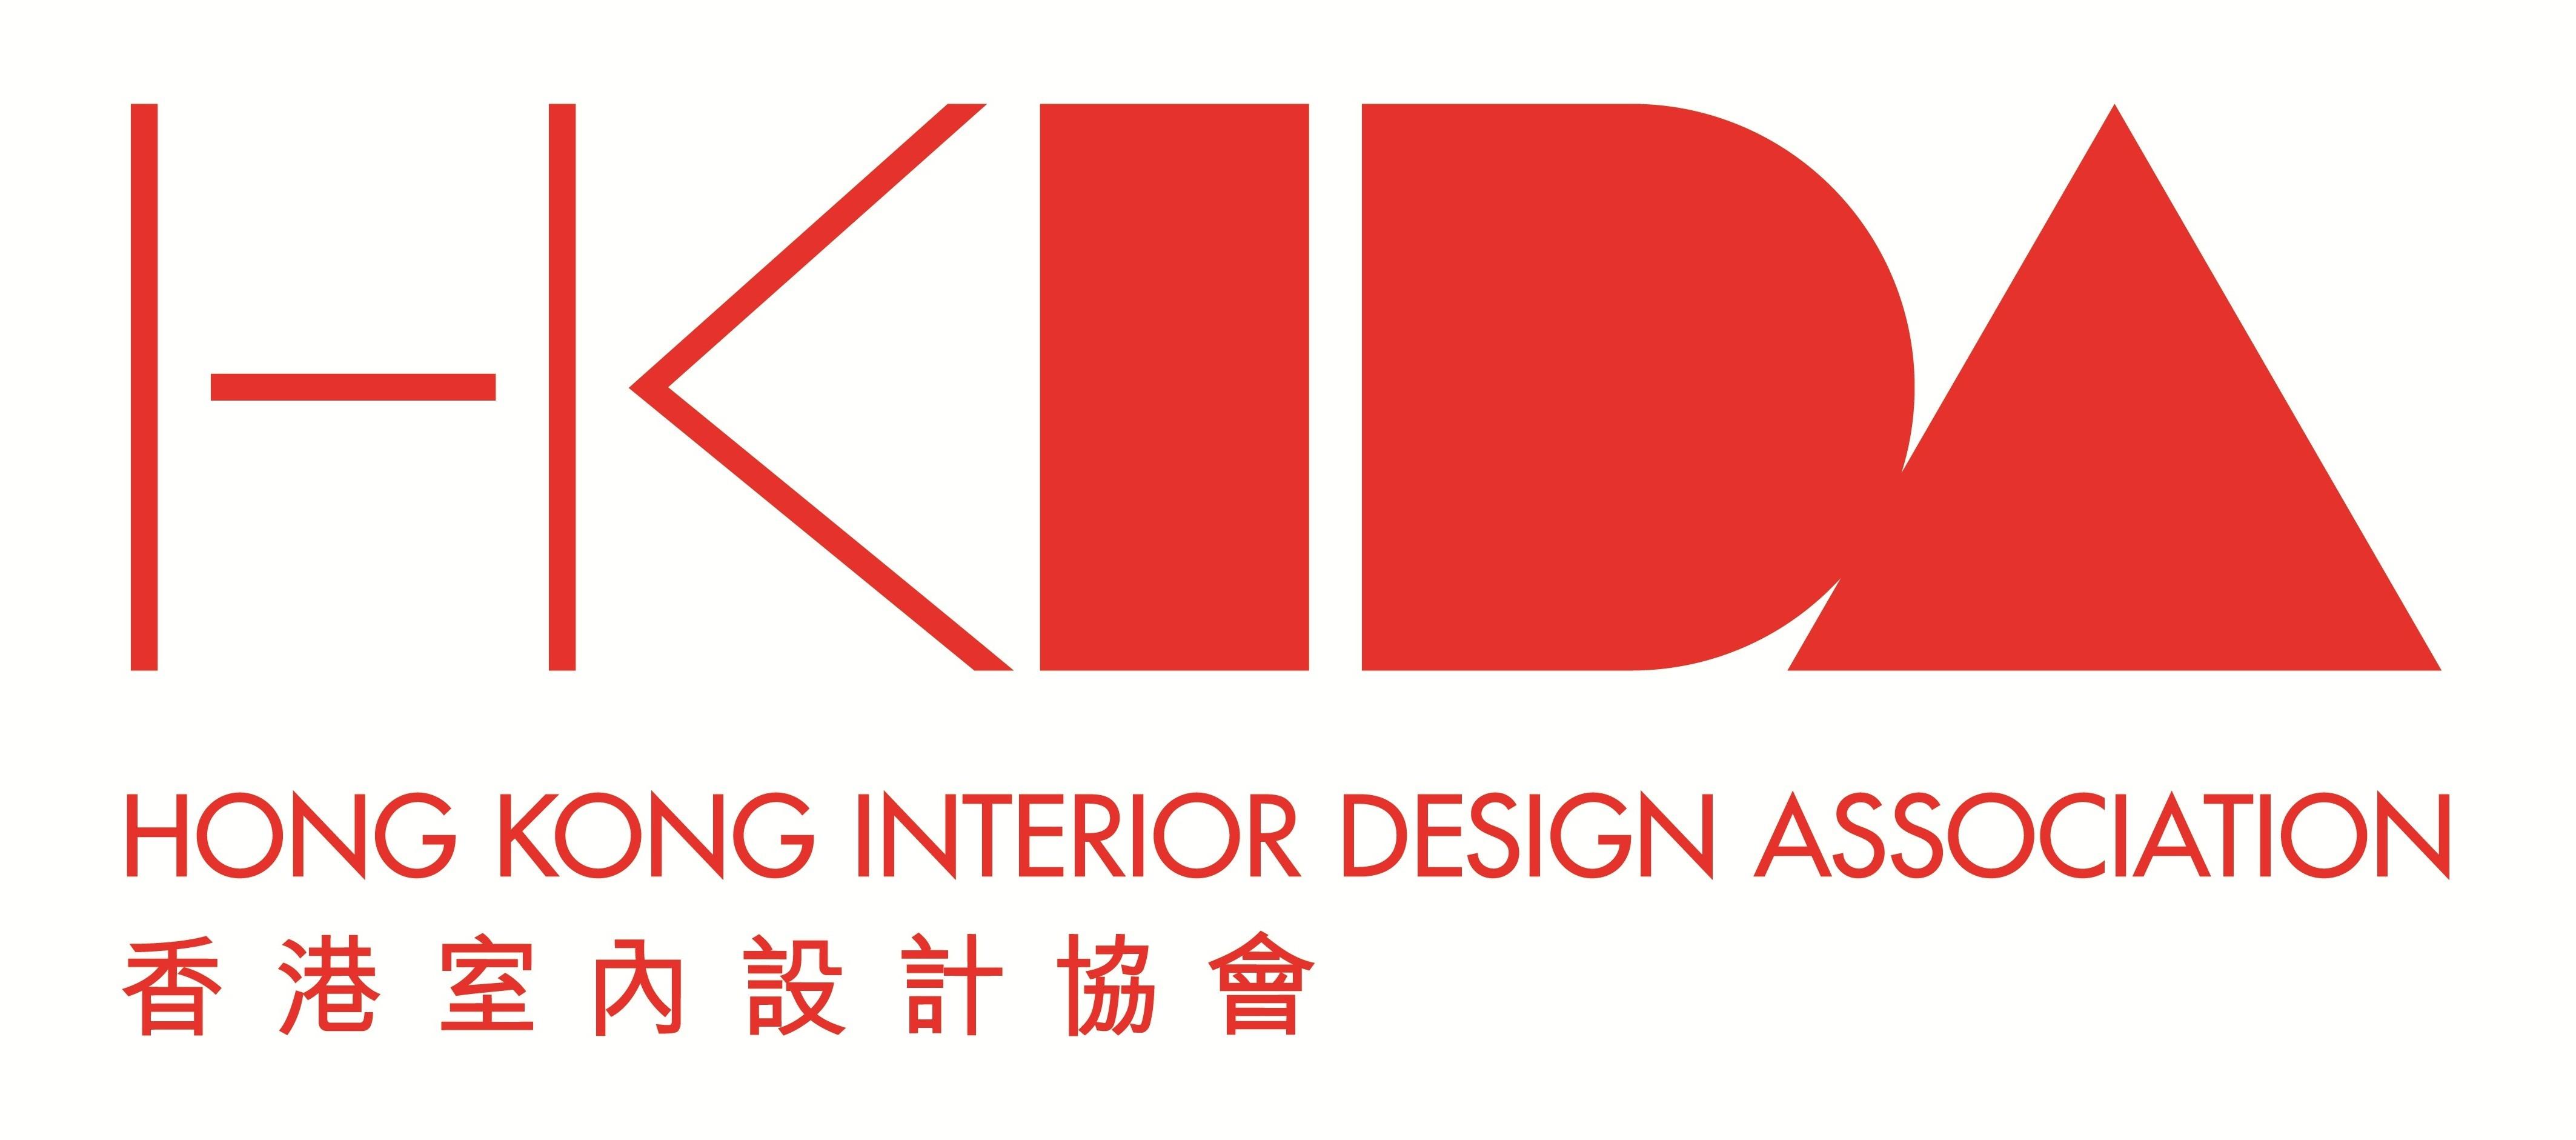 Hong Kong Interior Design Association Hkida Linkedin